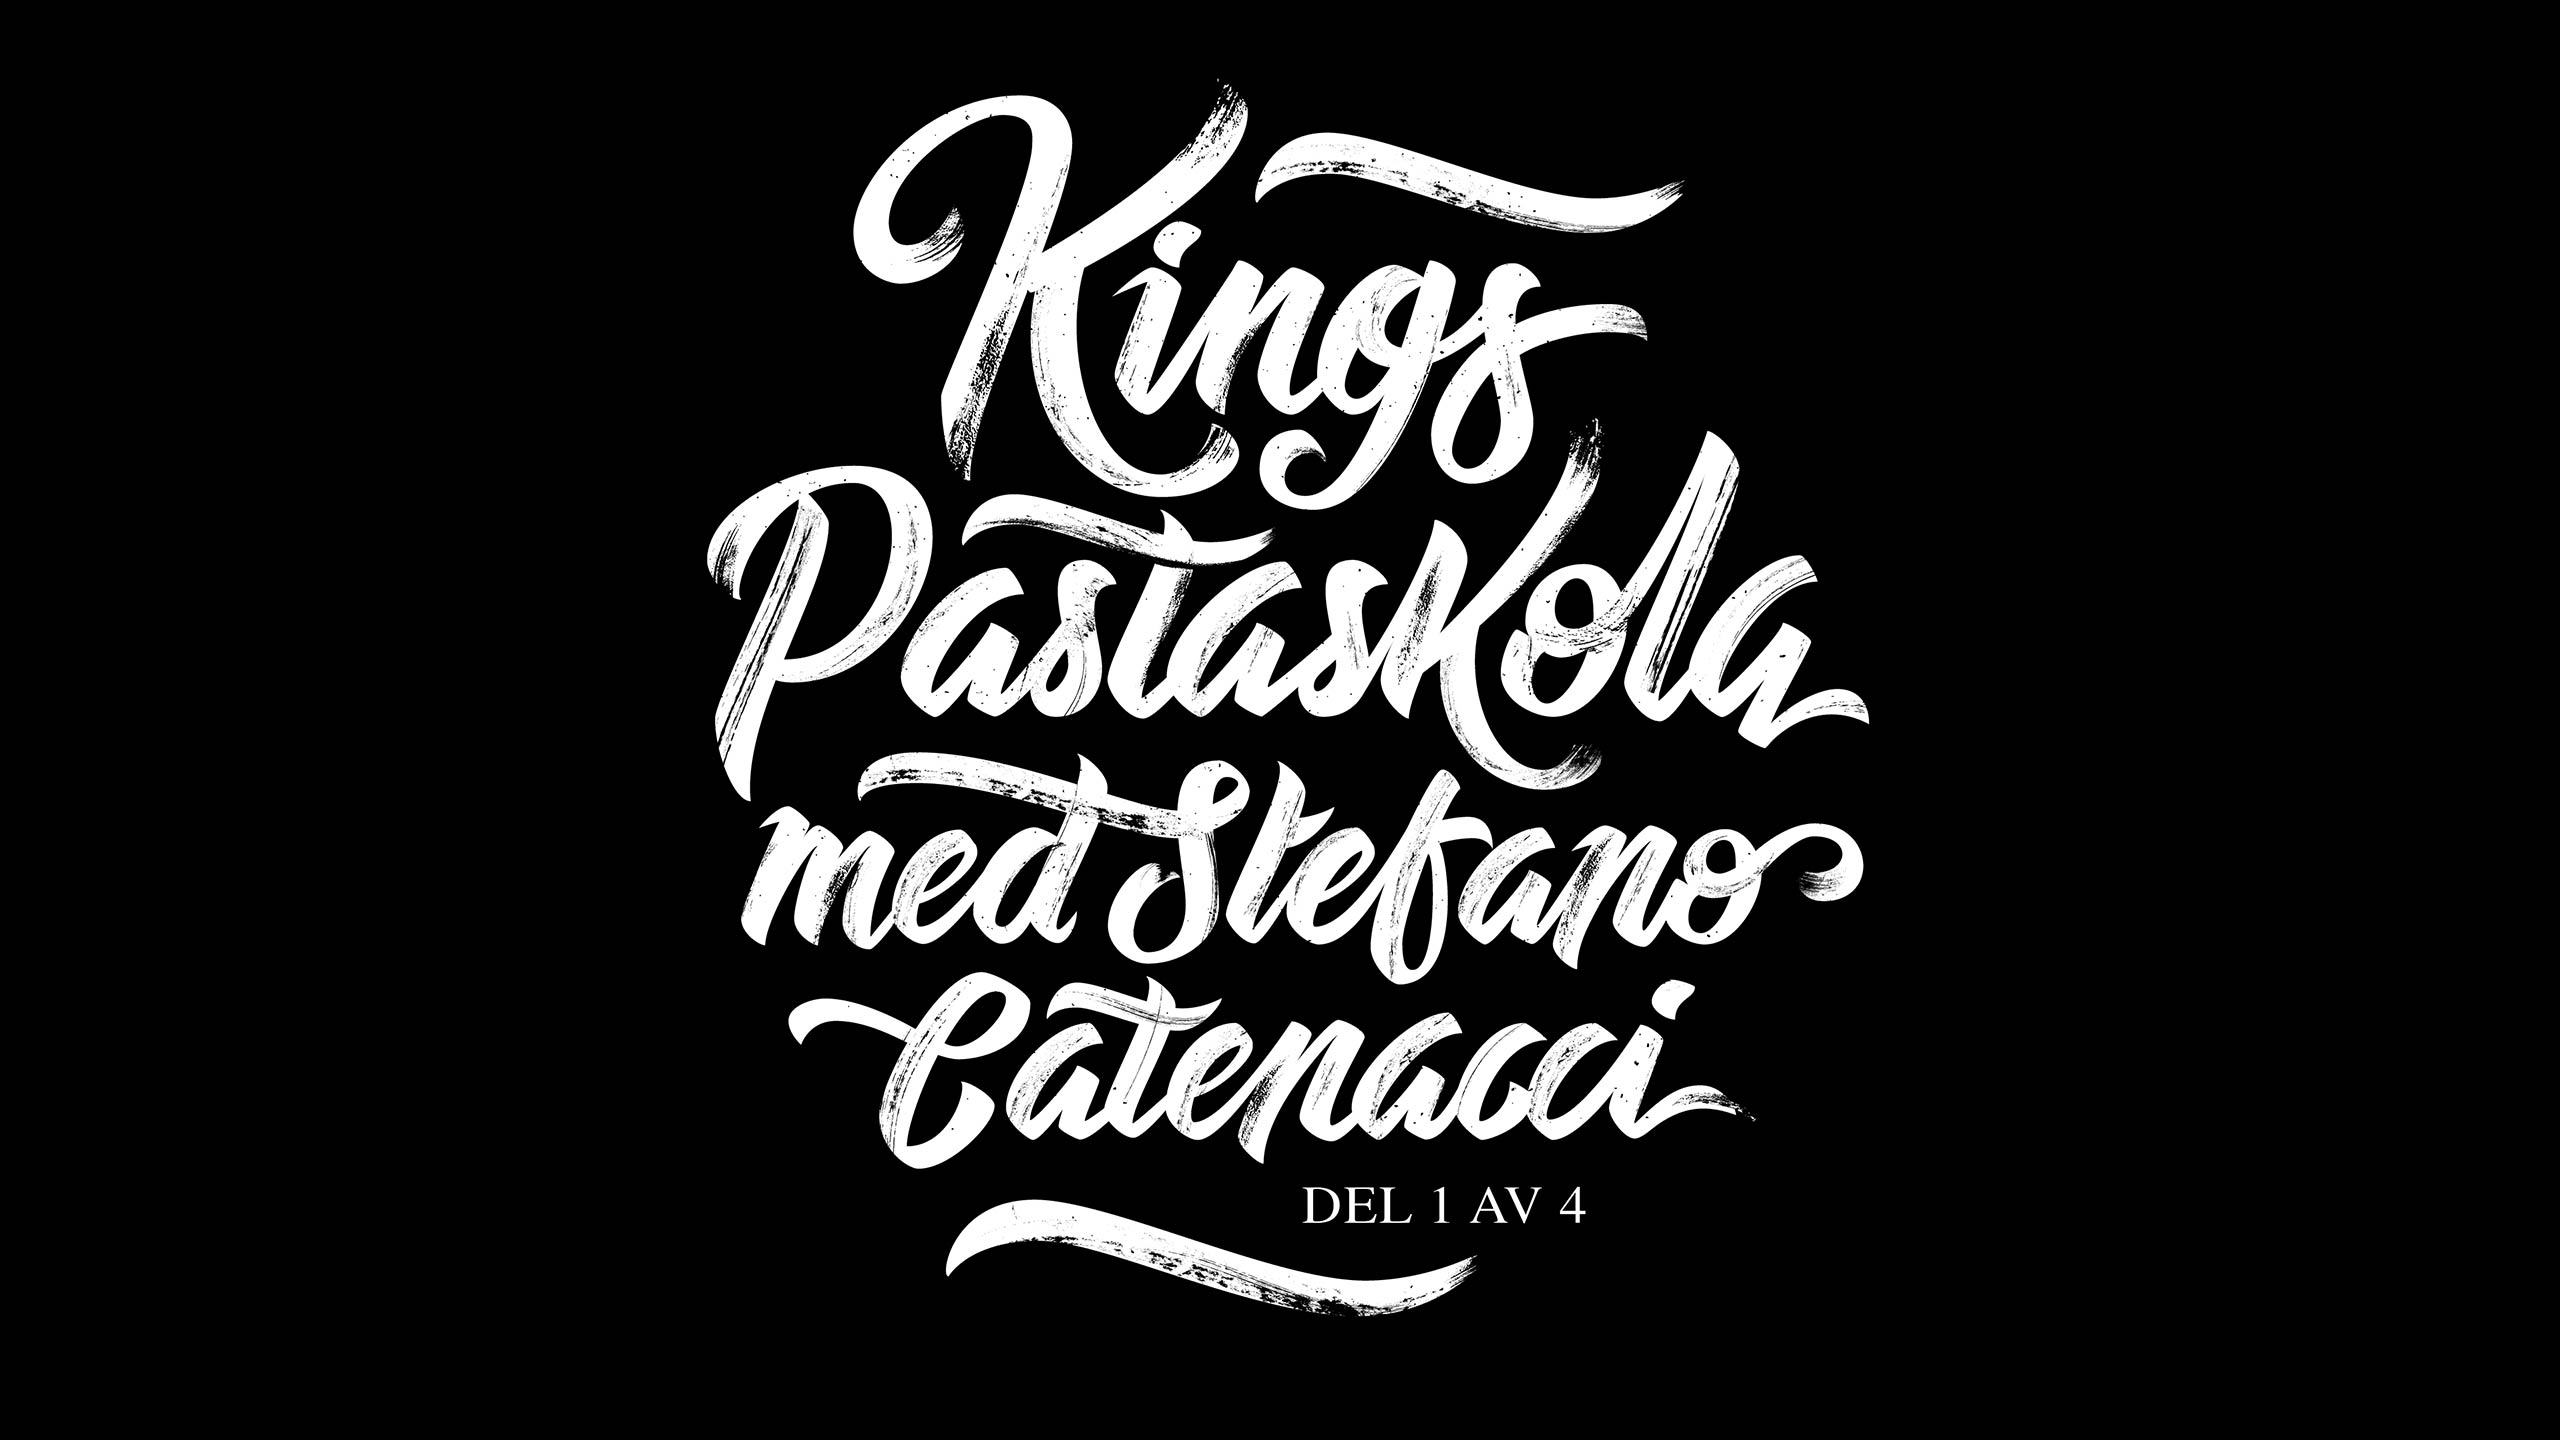 Final lettering for King Magazine.